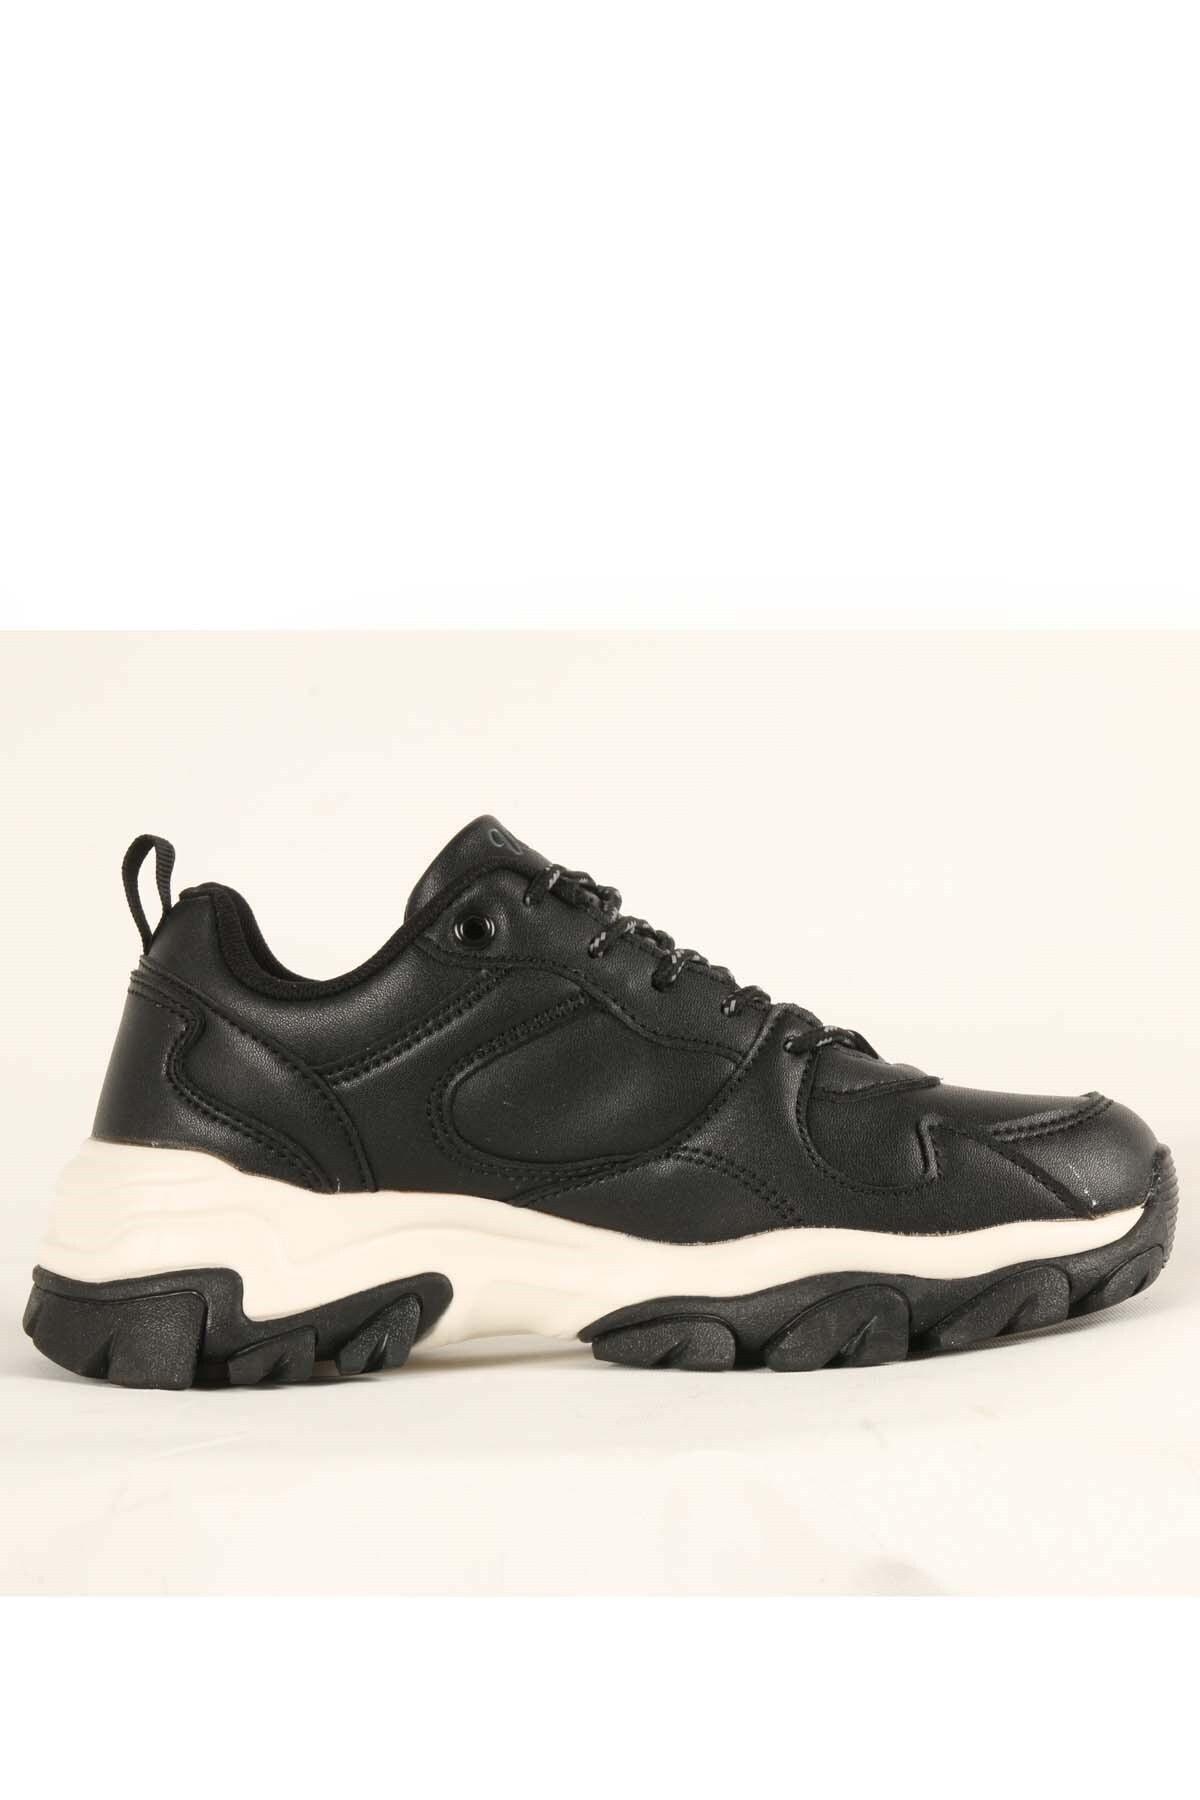 U.S POLO TRACKY Siyah Kadın Fashion Sneaker 100551450 2